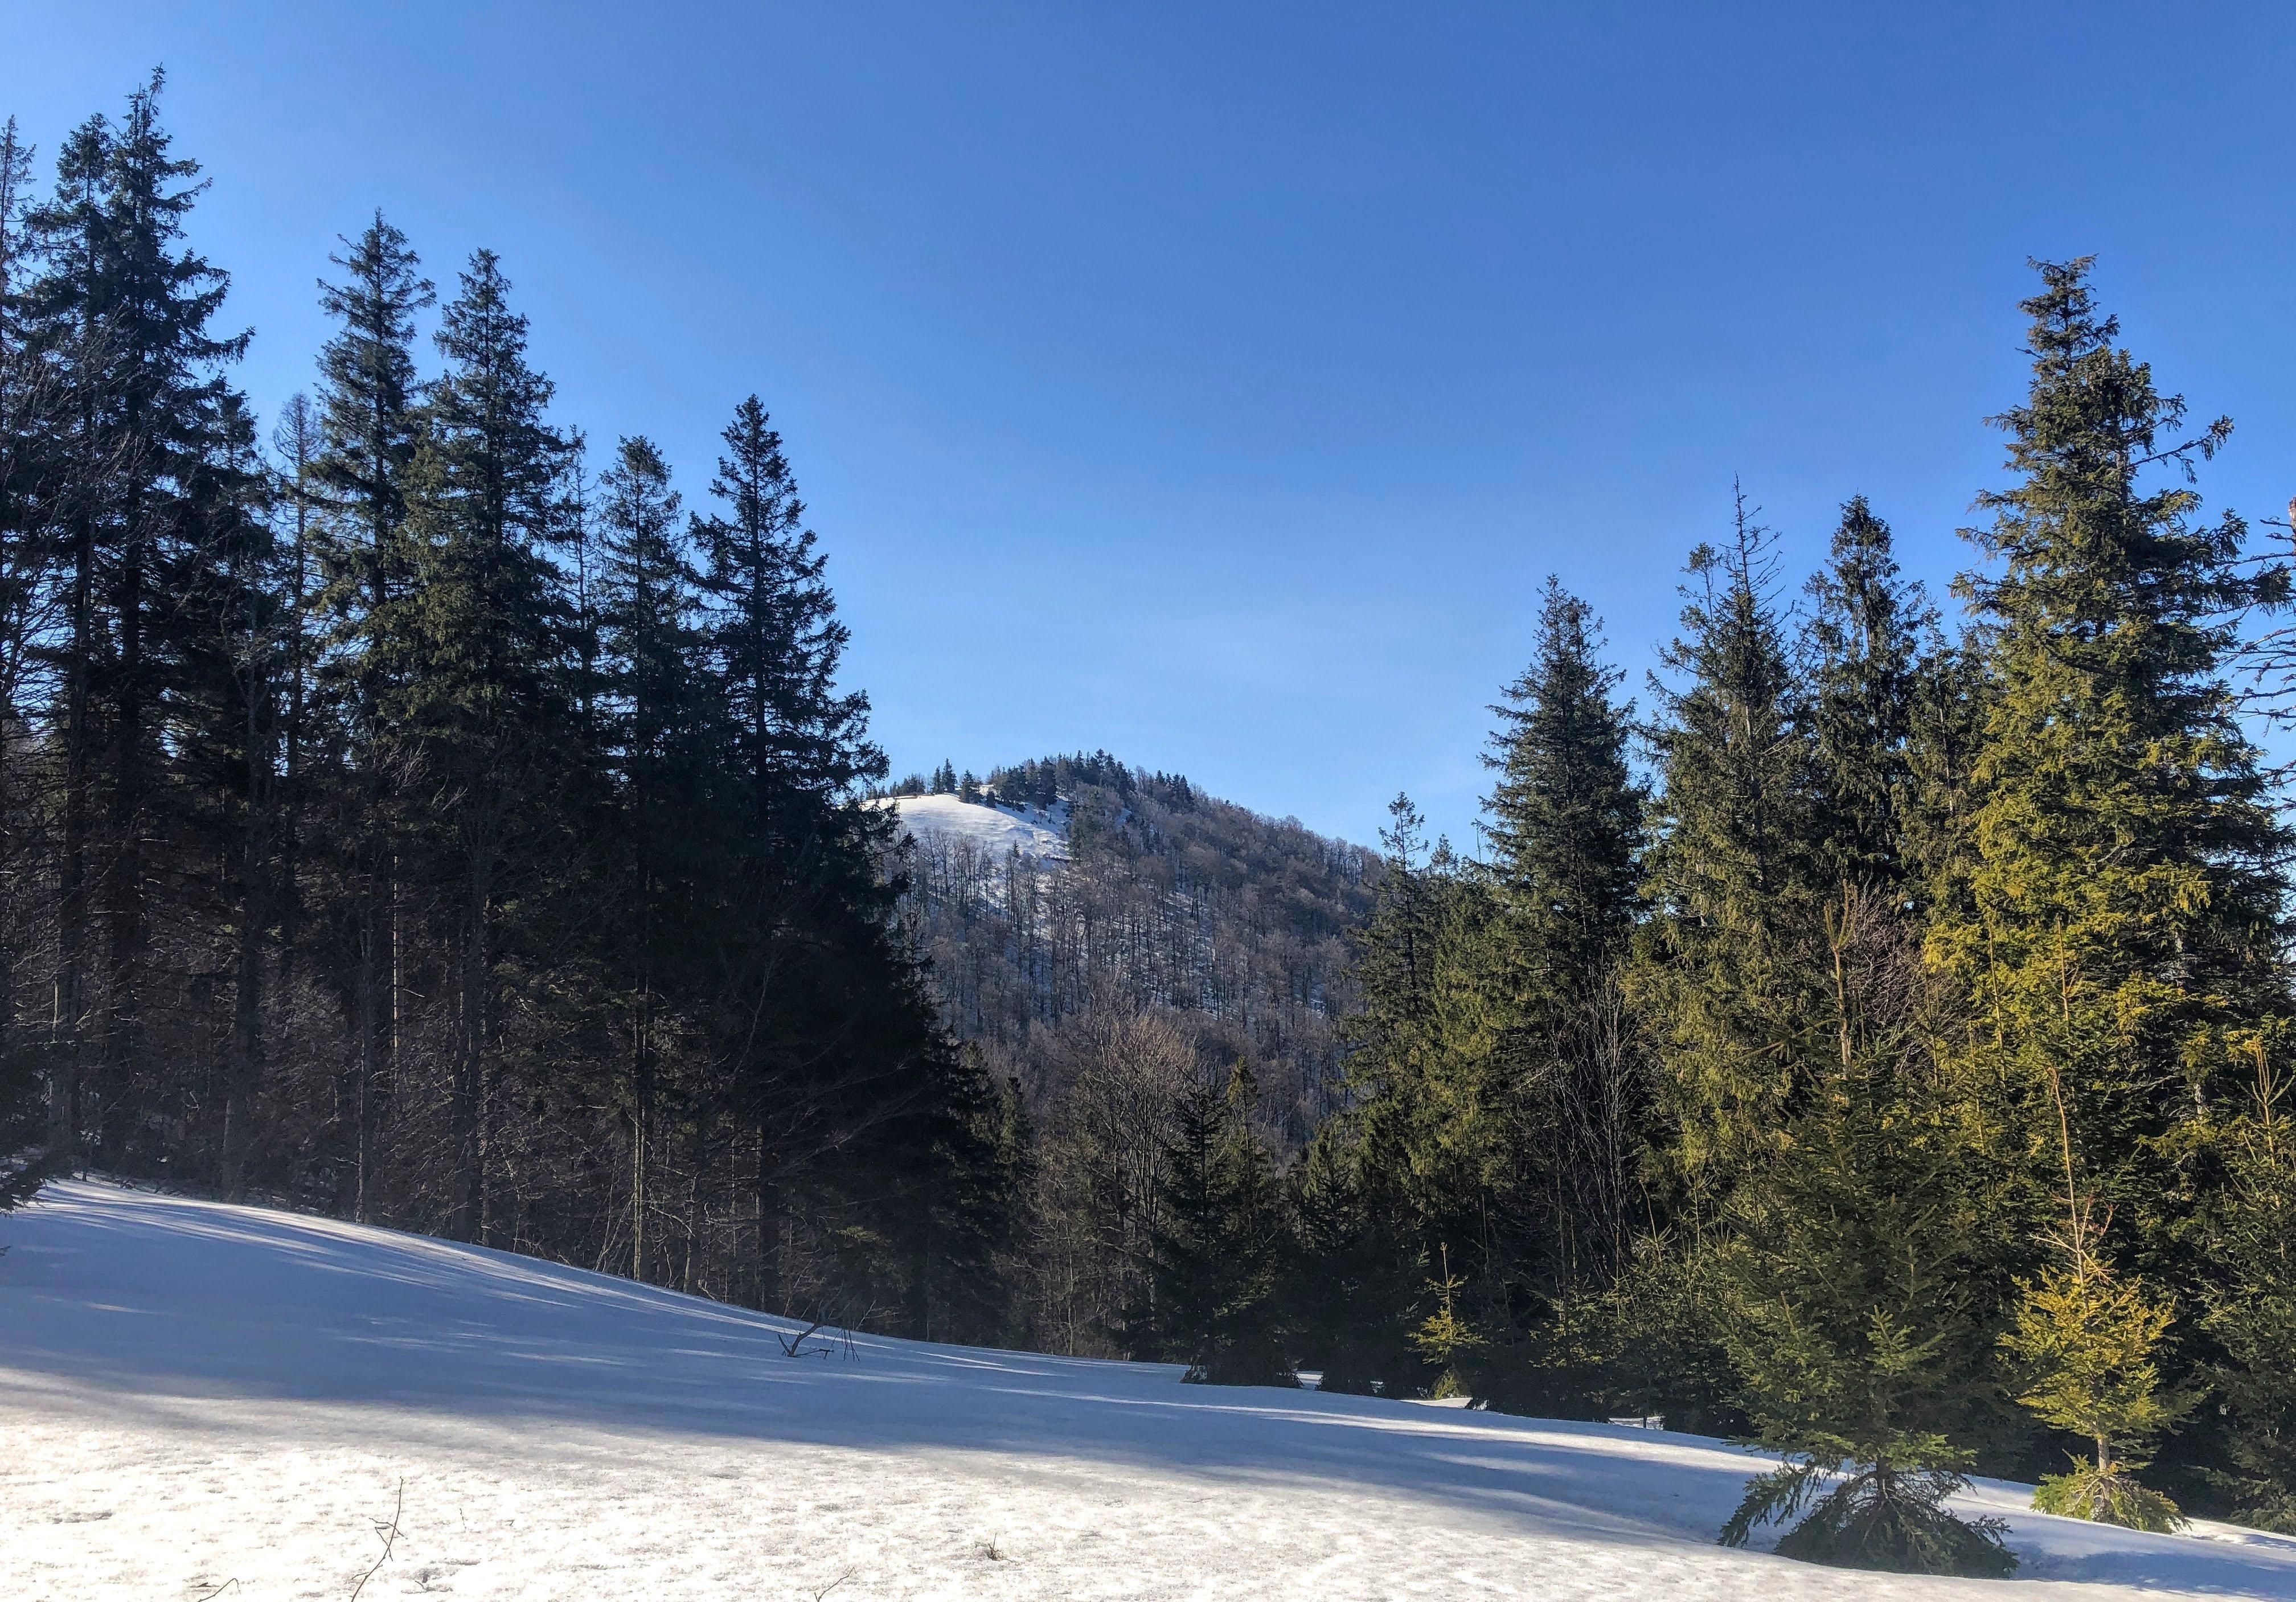 hiking on Mount Parashka in the Carpathian Mountains